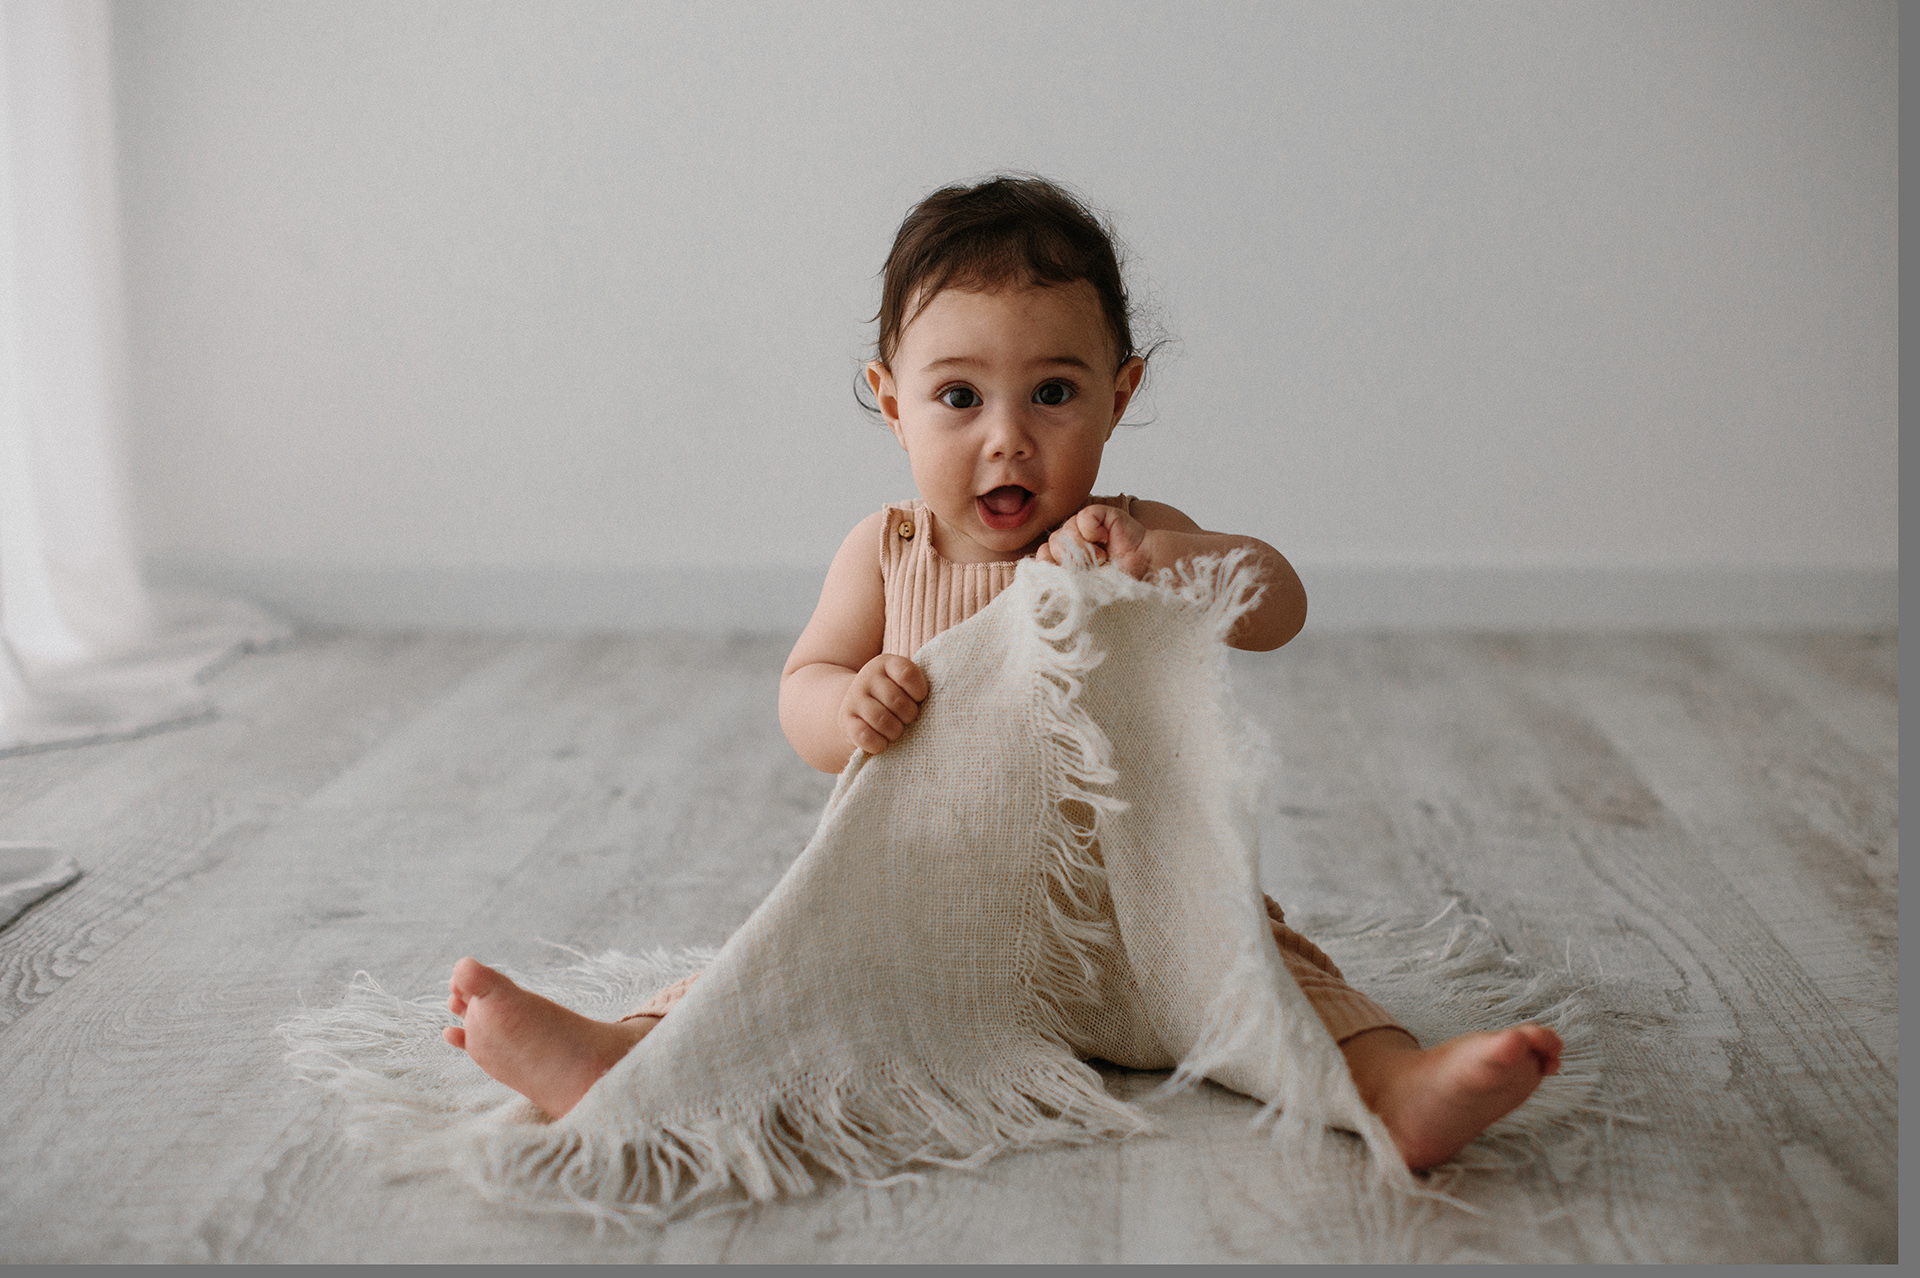 bebè si nasconde dietro una coperta